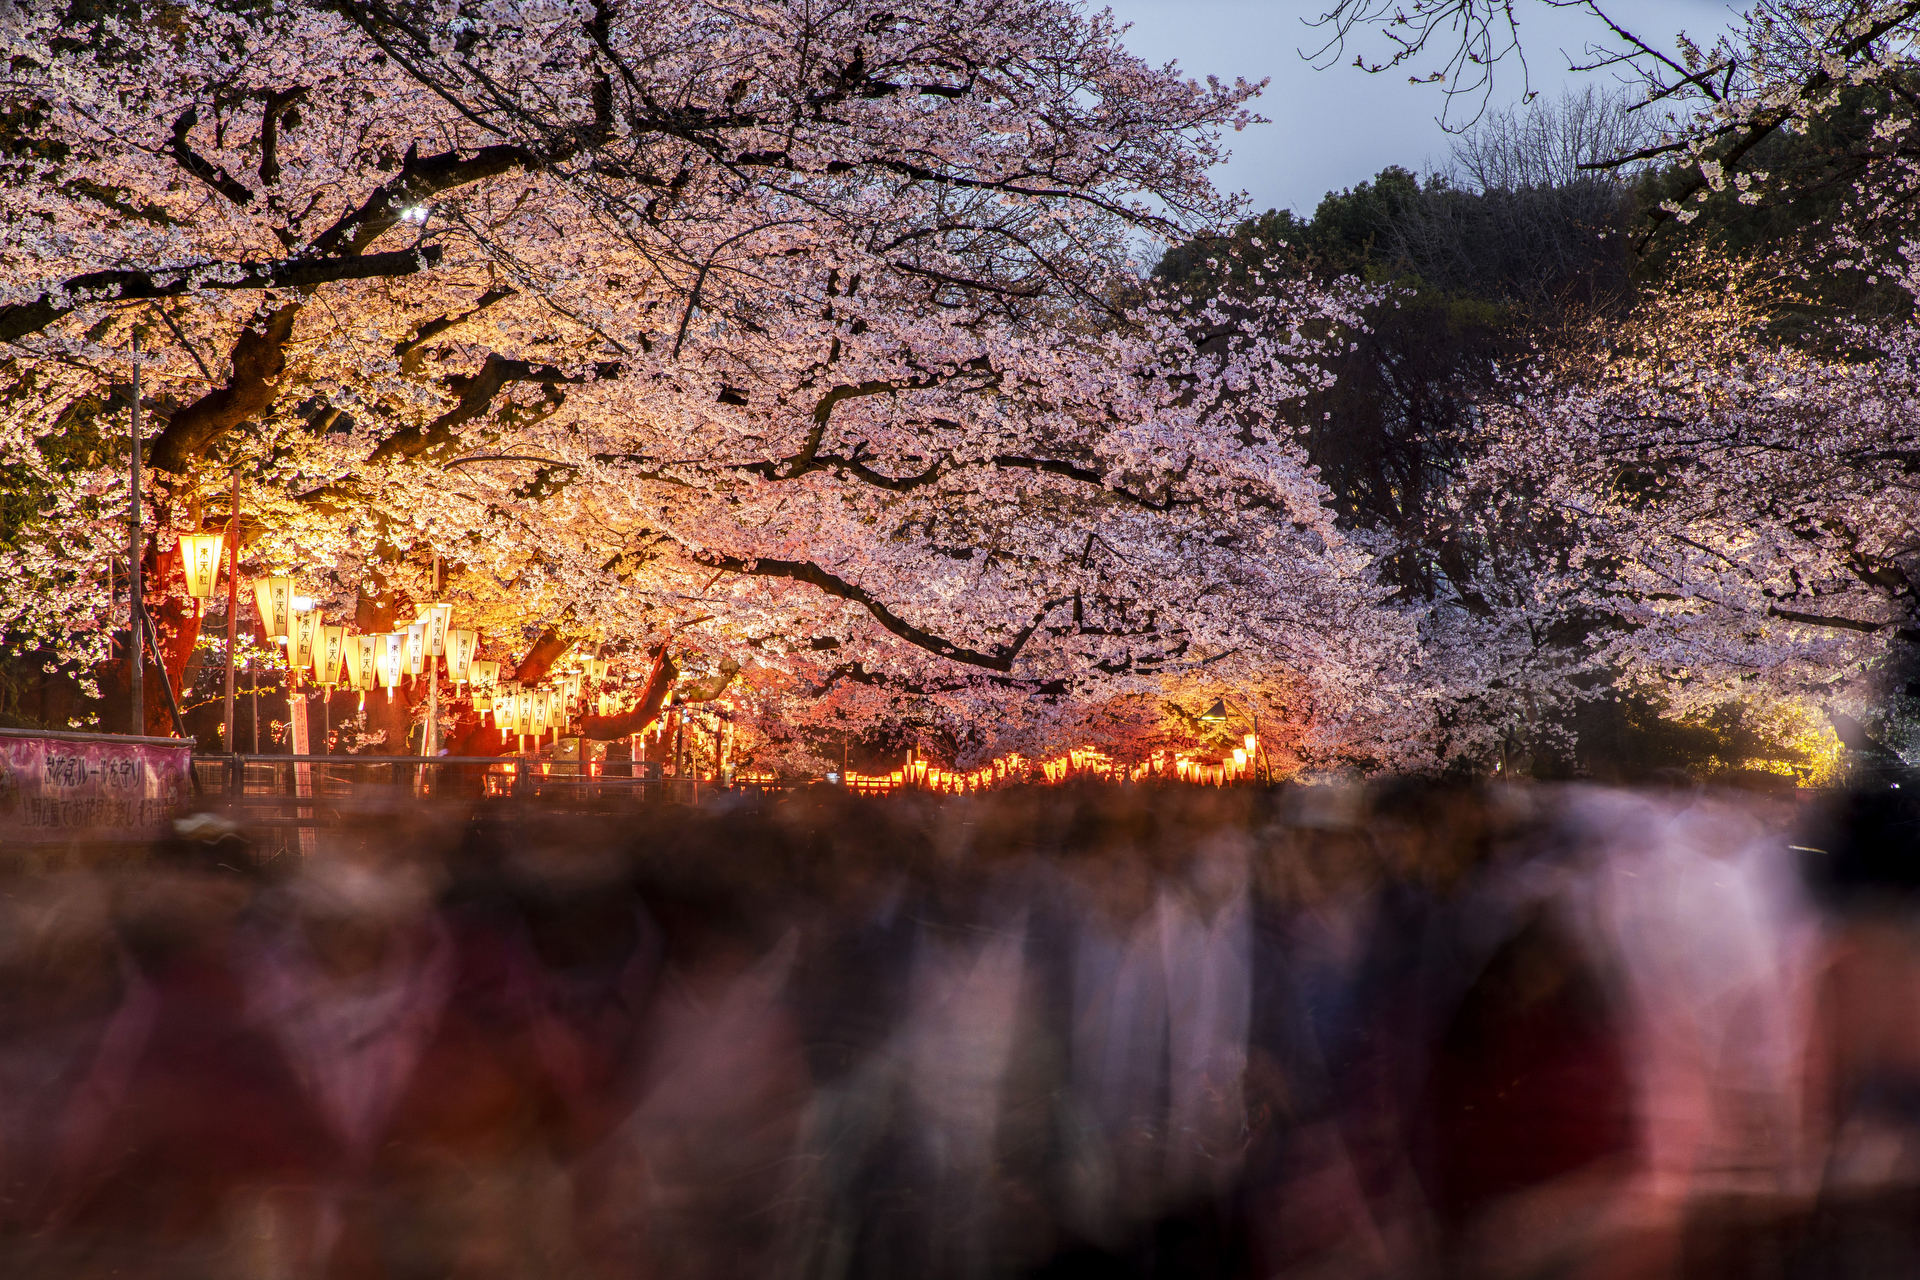 Sydney travel photographer, country, adventure, photo tour, travel photography, destinations, award winning, tips, lessons, Tokyo, Cherry Blossom, Sakura, Ueno park, Japan, tree